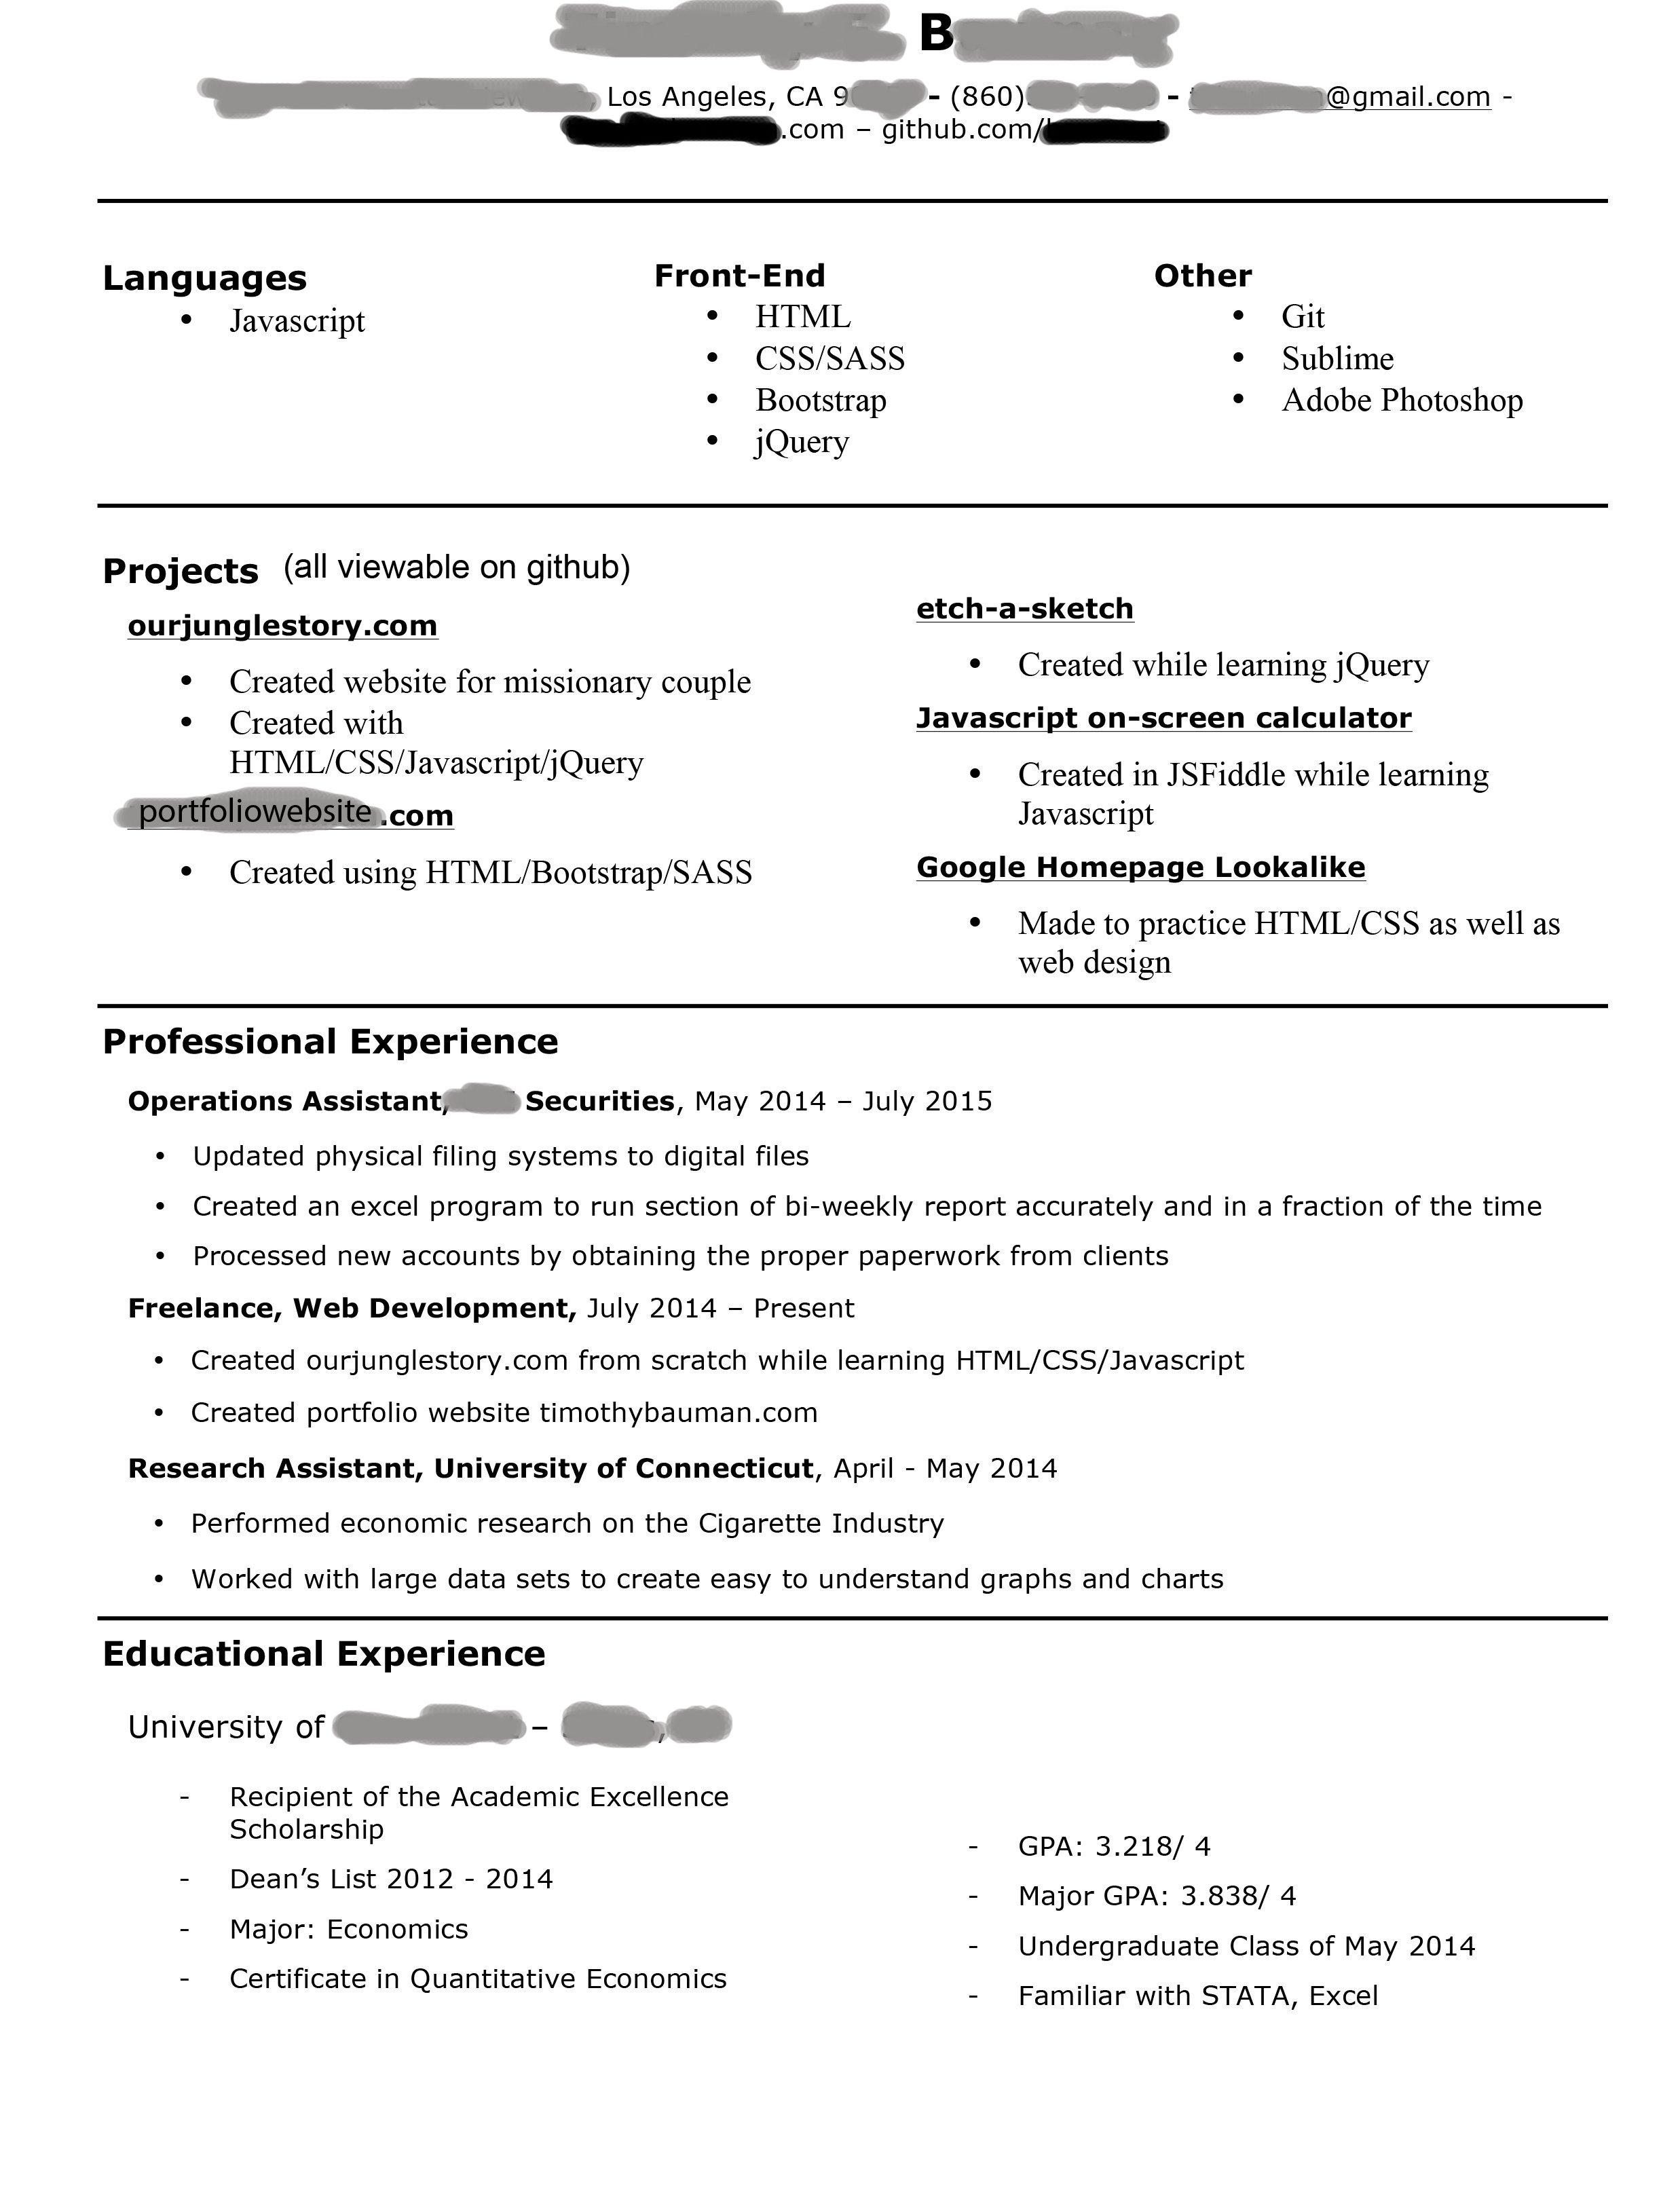 Junior Web Developer Resume Starting to Look for Jobs as A Jr Front End Web Developer